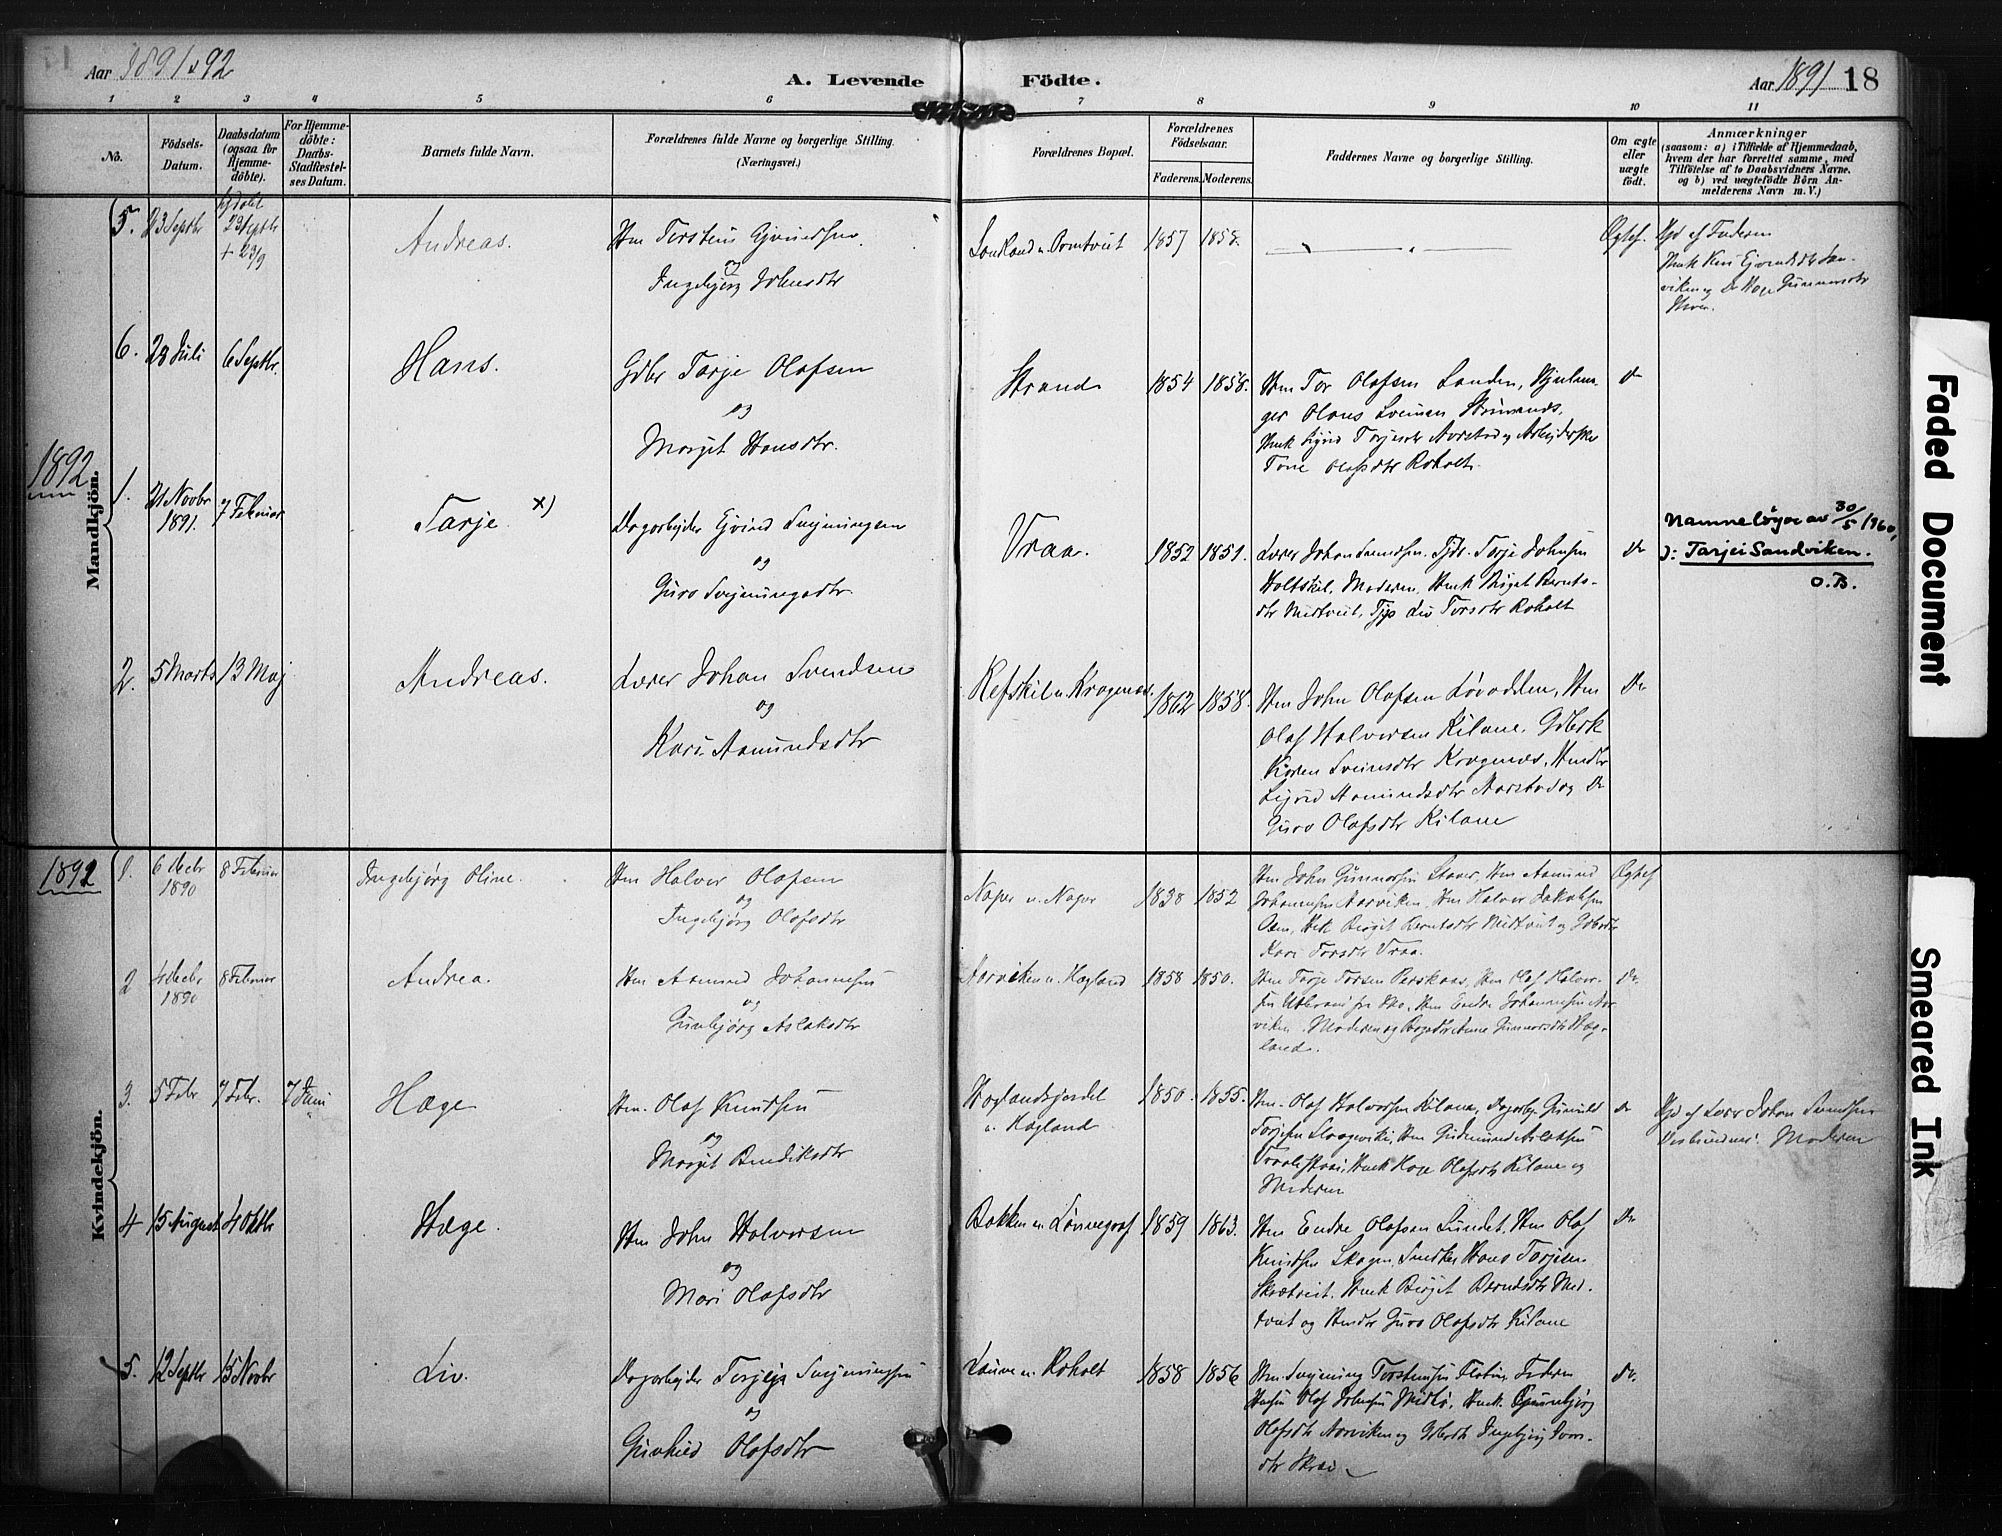 SAKO, Kviteseid kirkebøker, F/Fc/L0002: Ministerialbok nr. III 2, 1882-1908, s. 18